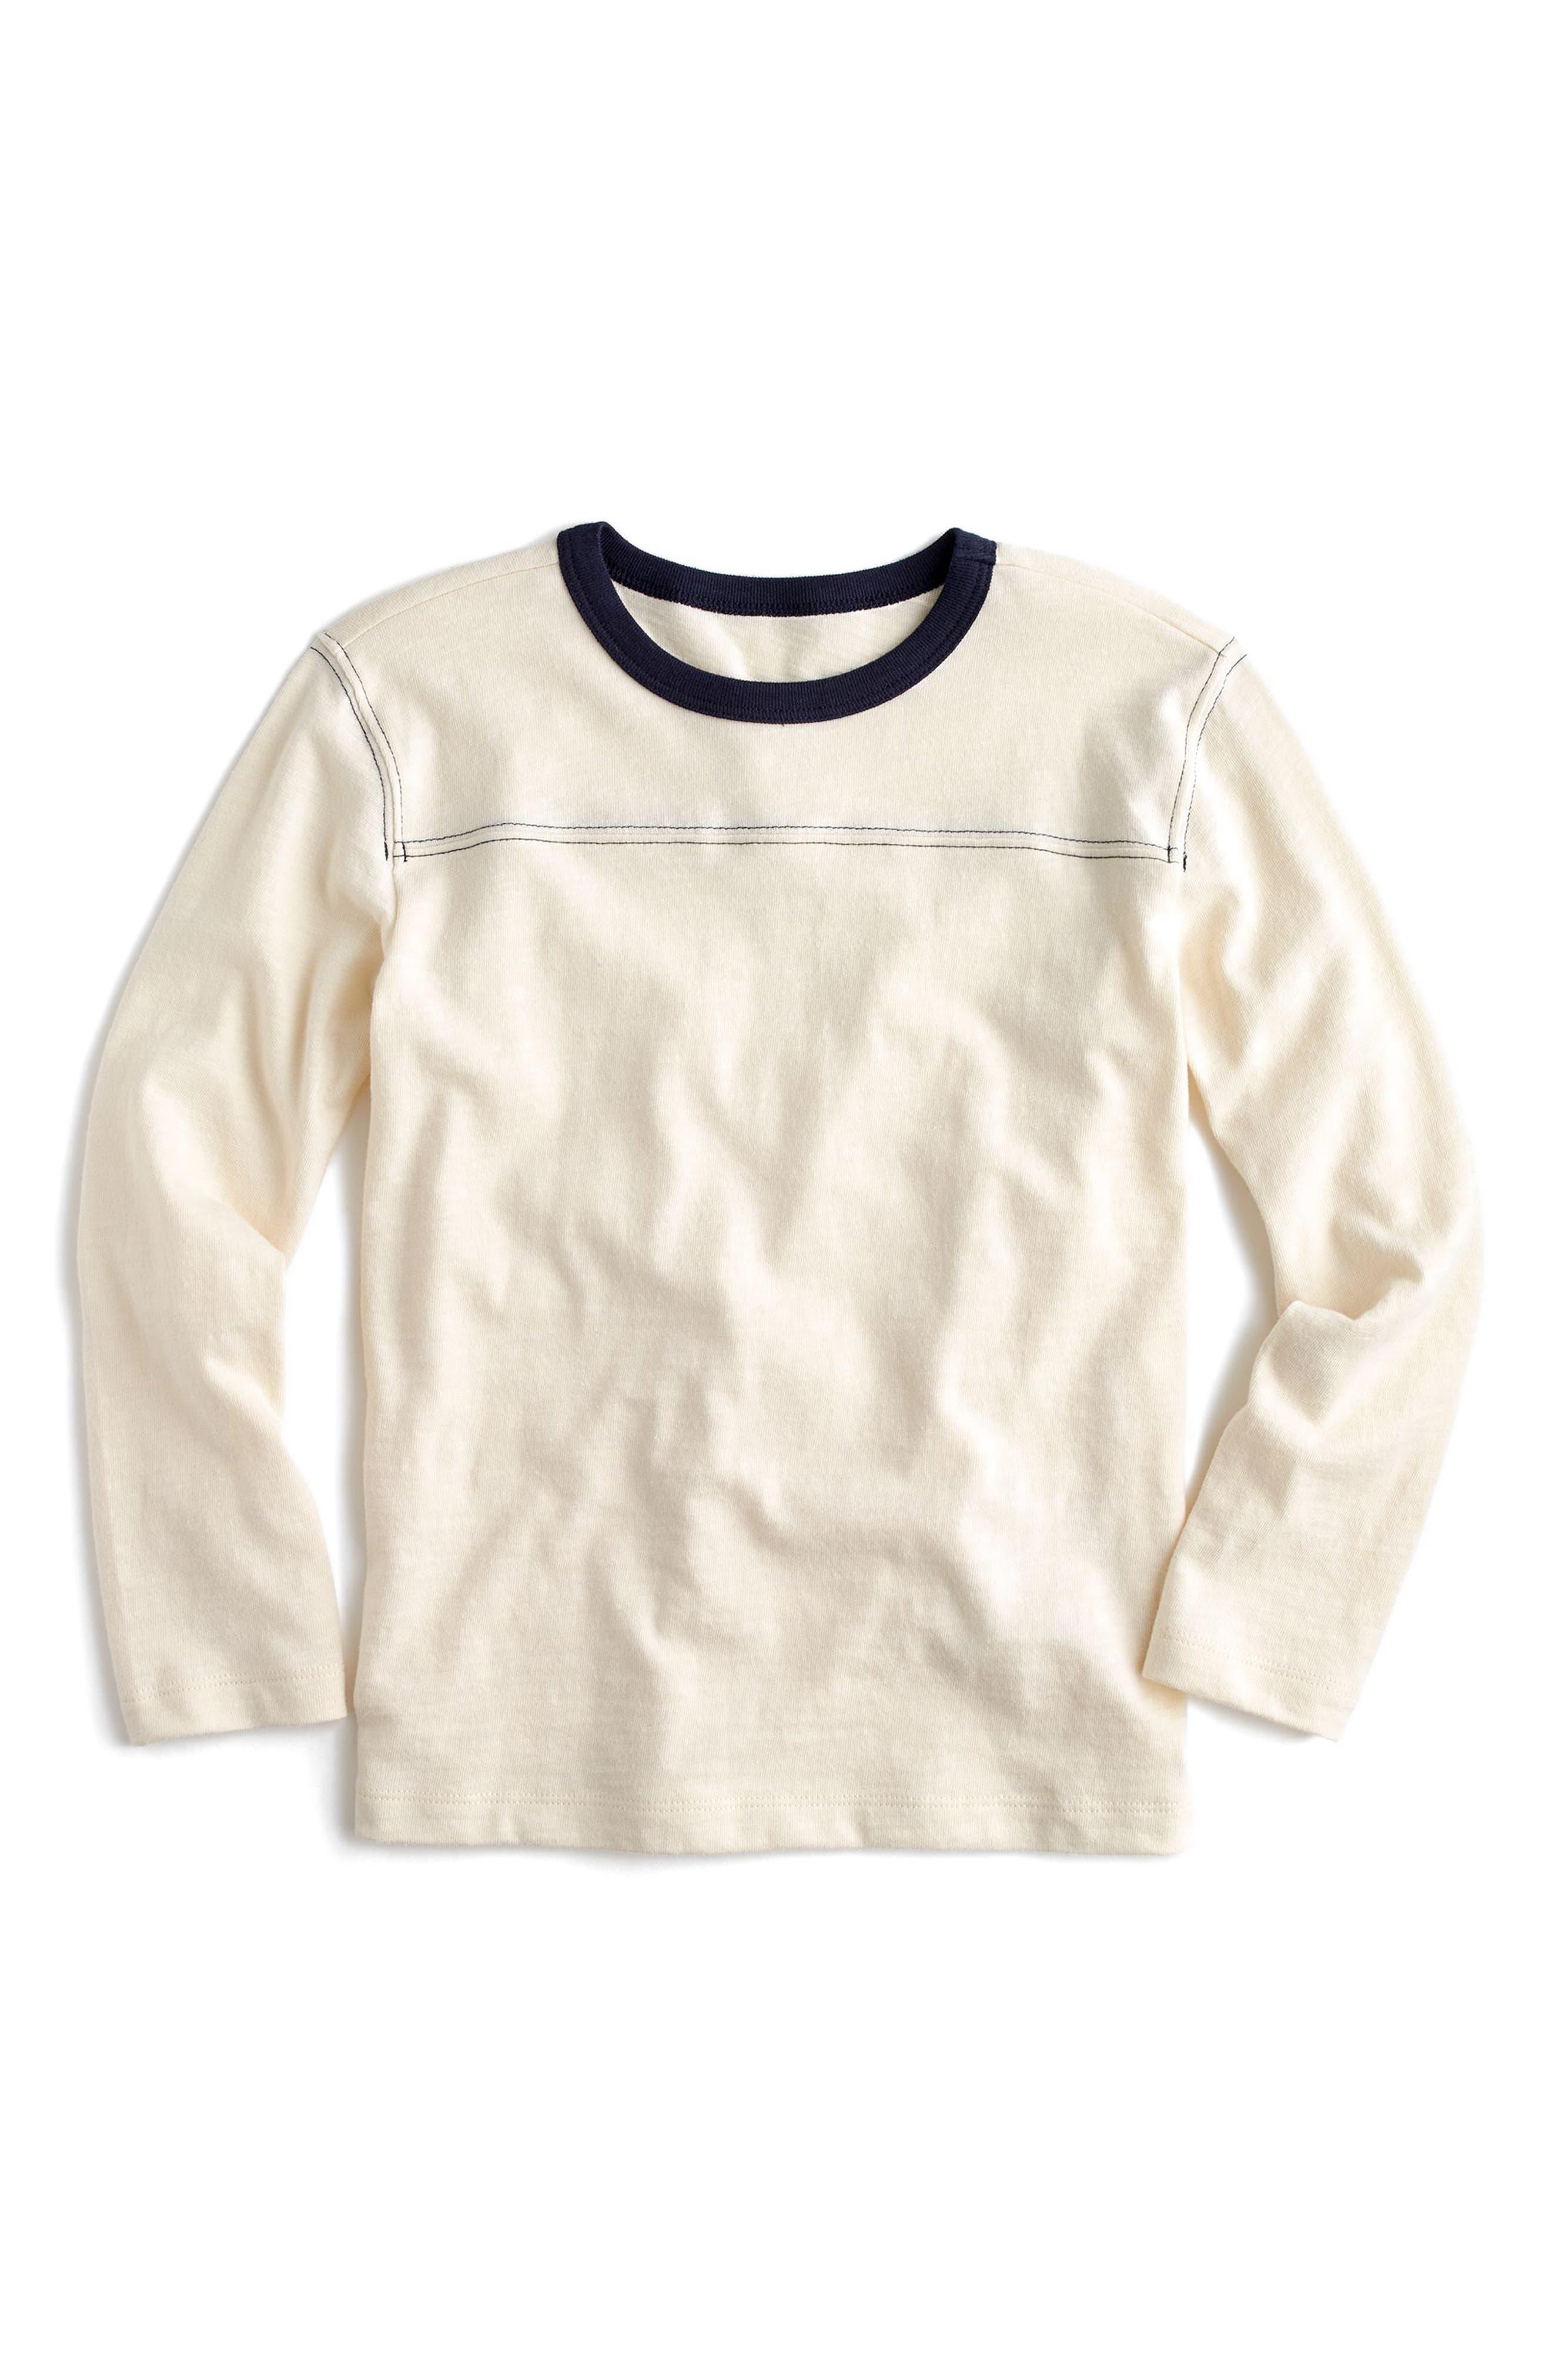 crewcuts by J.Crew Long Sleeve Ringer T-Shirt (Toddler Boys, Little Boys & Big Boys)